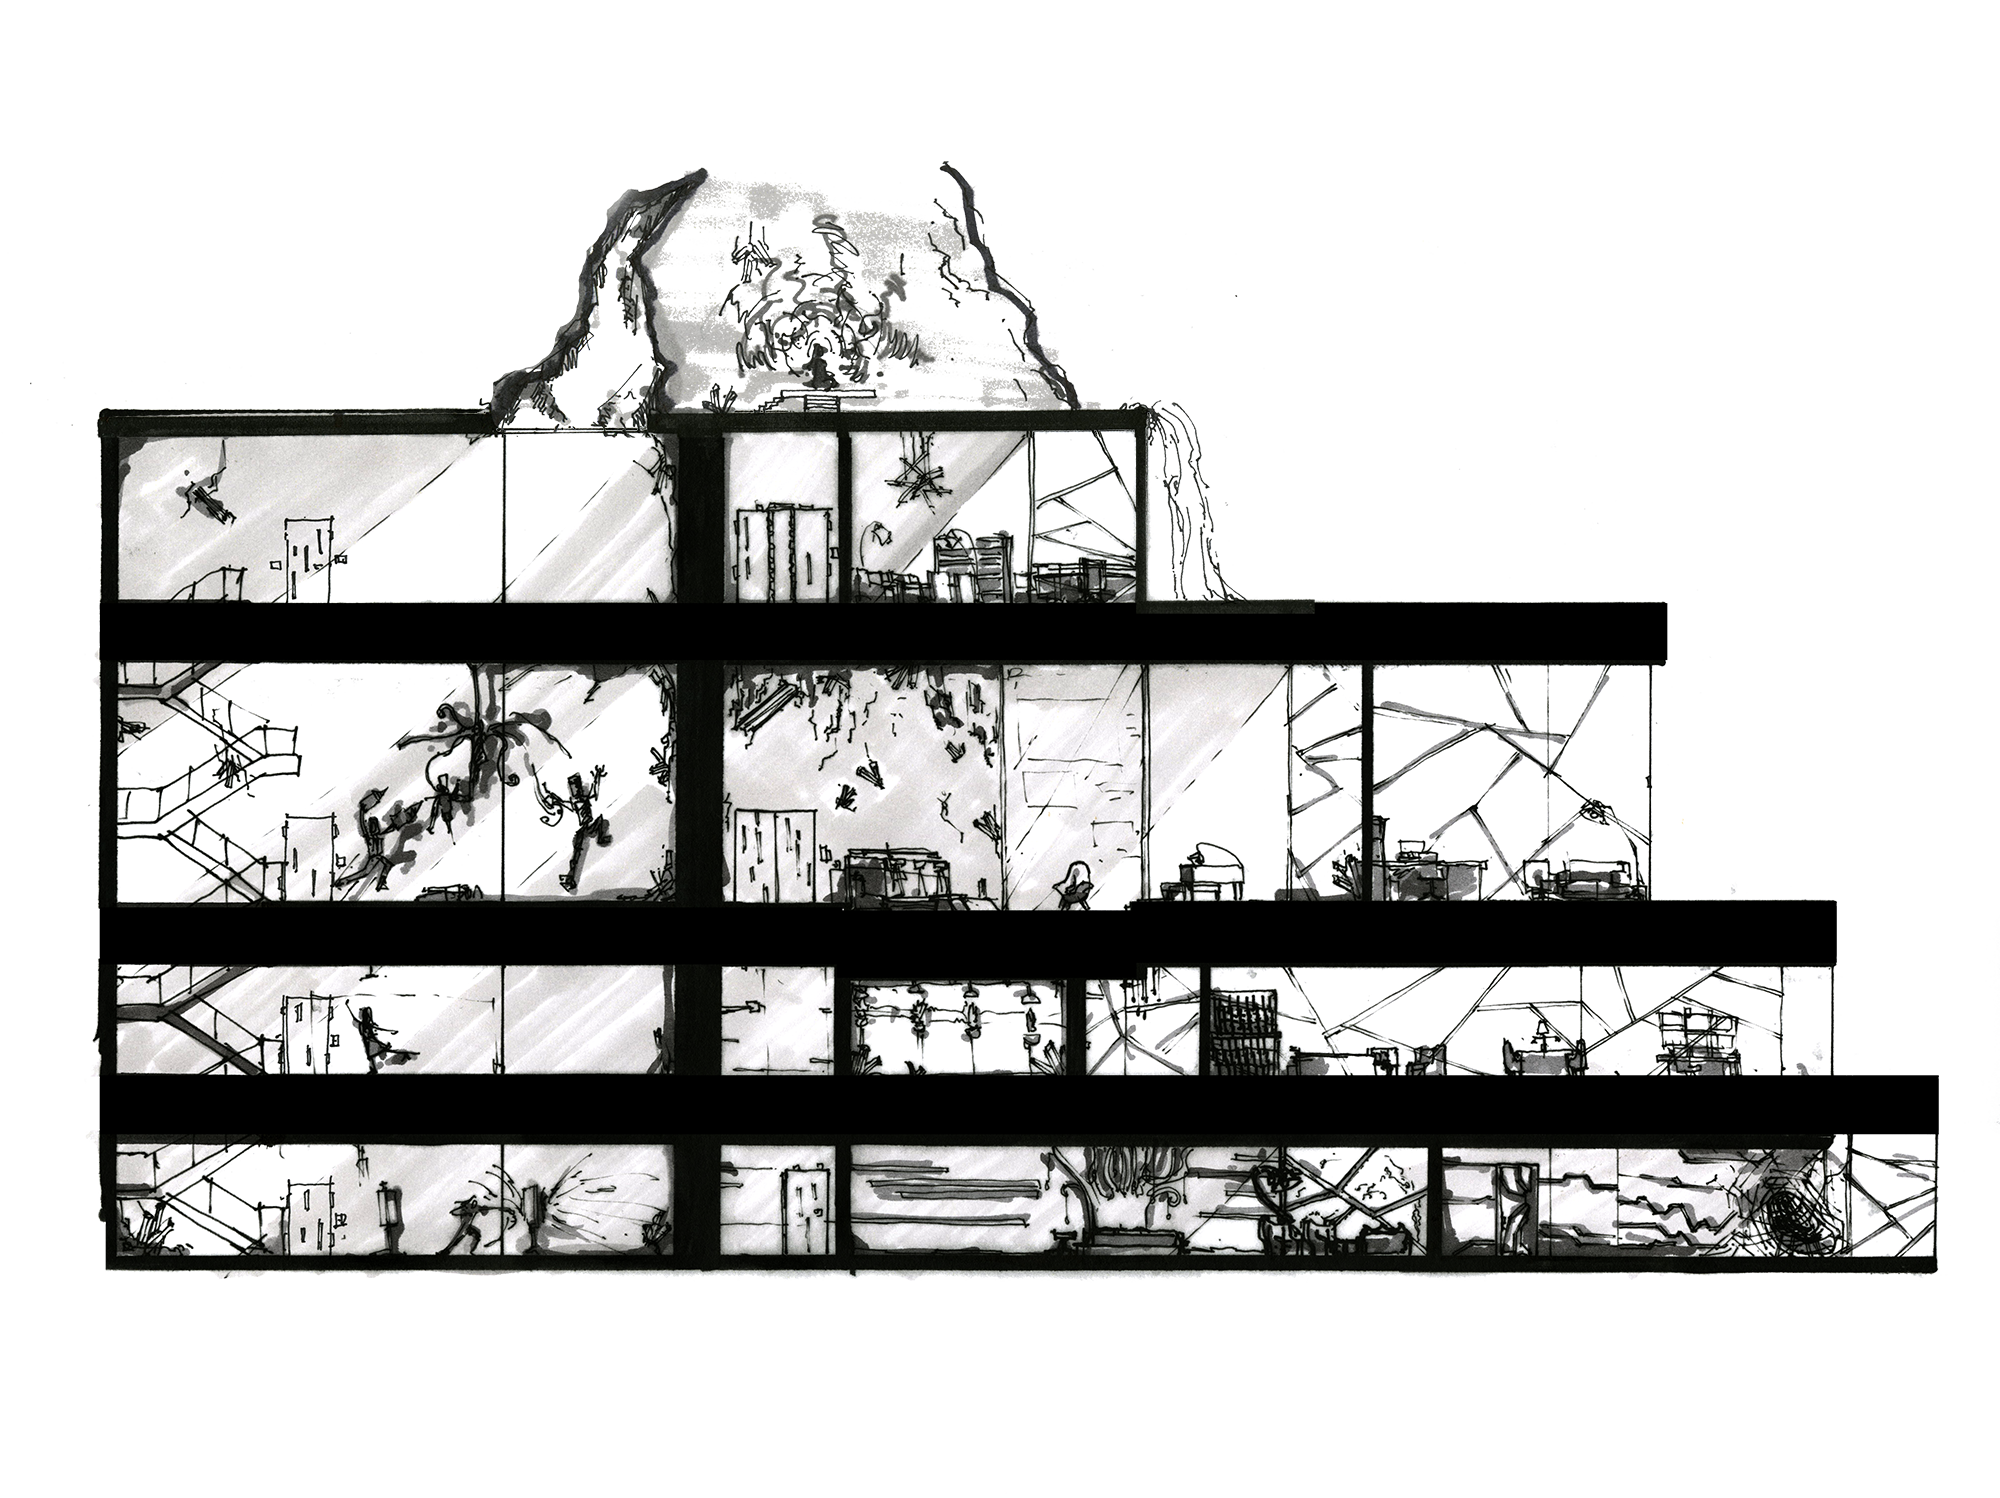 Supervillain charrette sarah wallstedt design - Charrette dessin ...